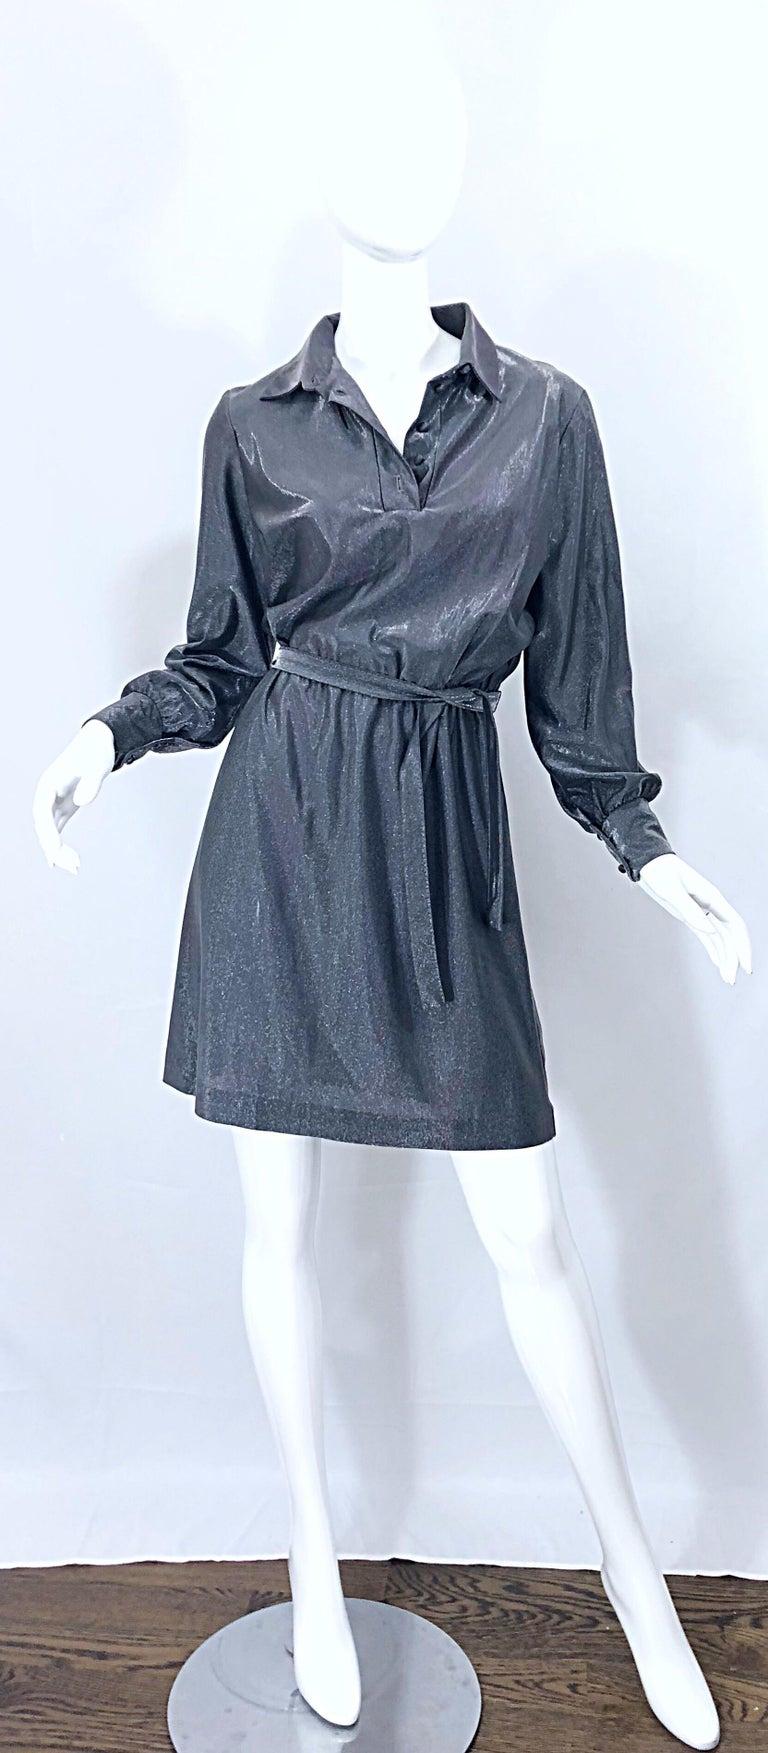 1970s Gunmetal Metallic Silver Gray Belted Vintage 70s Long Sleeve Shirt Dress For Sale 4